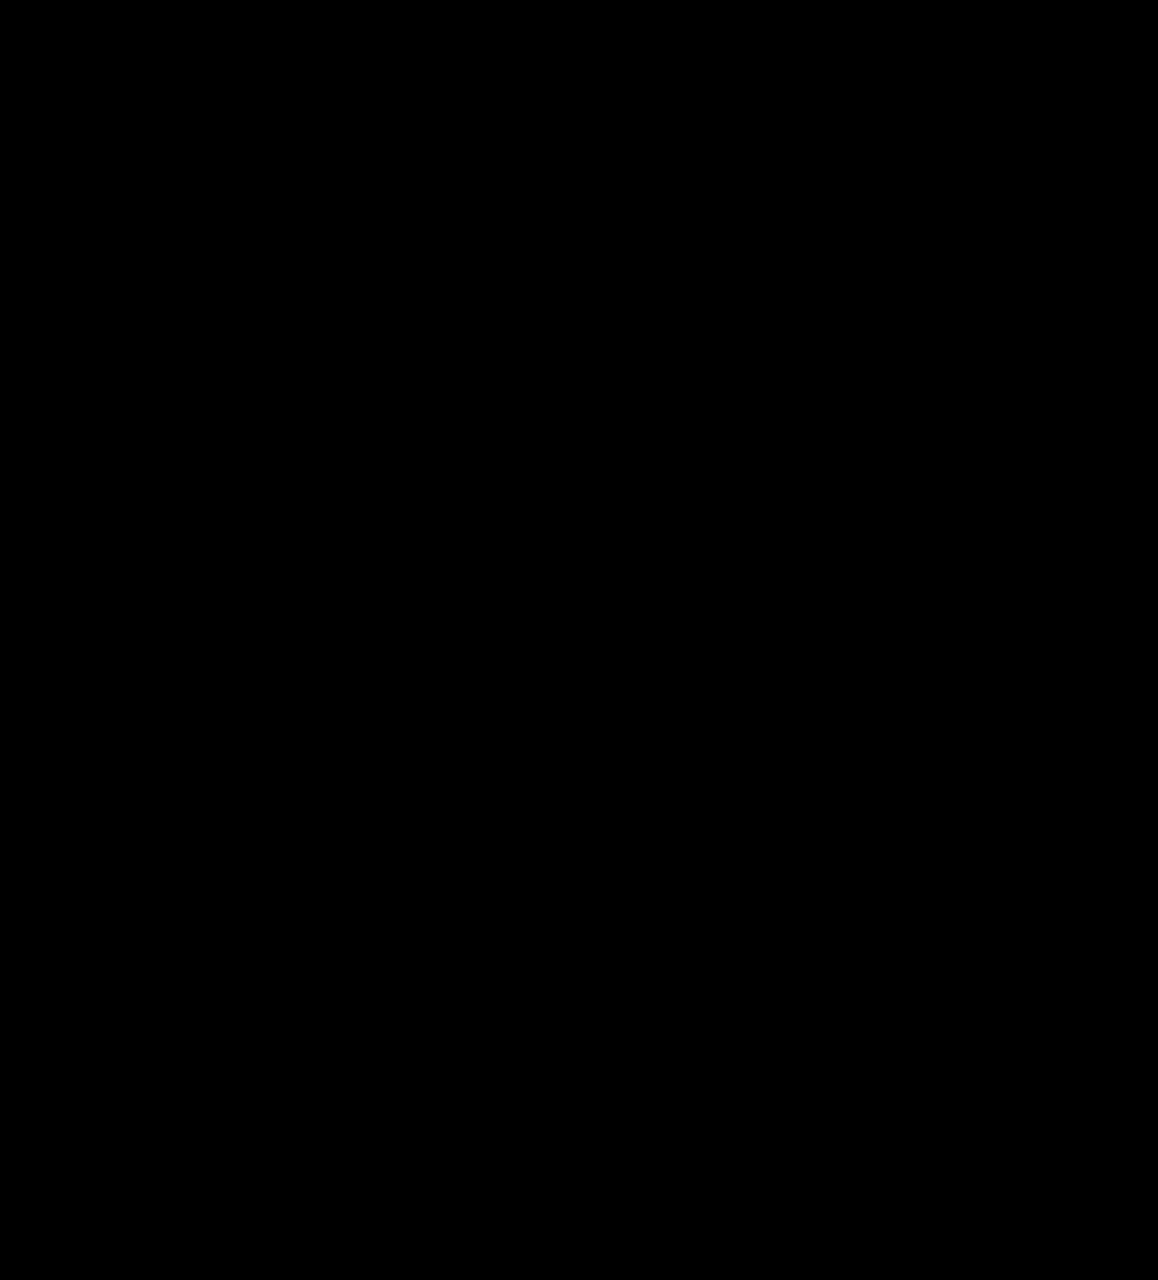 Silueta Dinosaurio Dino Lagarto Graficos Vectoriales Gratis En Pixabay 8 siluetas de dinosaurios en alta calidad de 300 dpi archivos disponible como descargas instantáneas. https creativecommons org licenses publicdomain